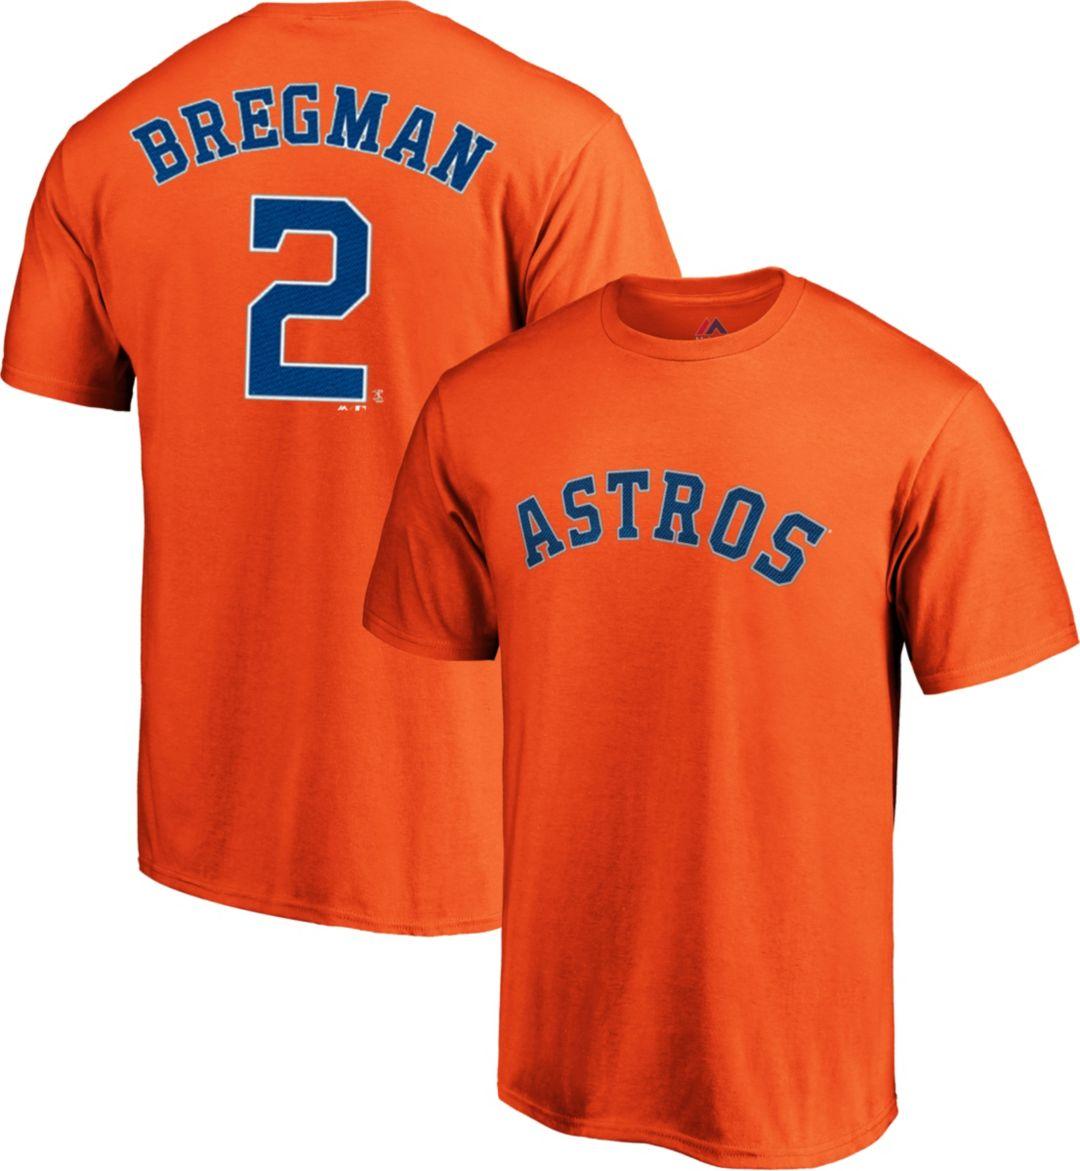 pretty nice 5a11e 8f05c Majestic Youth Houston Astros Alex Bregman #2 Orange T-Shirt